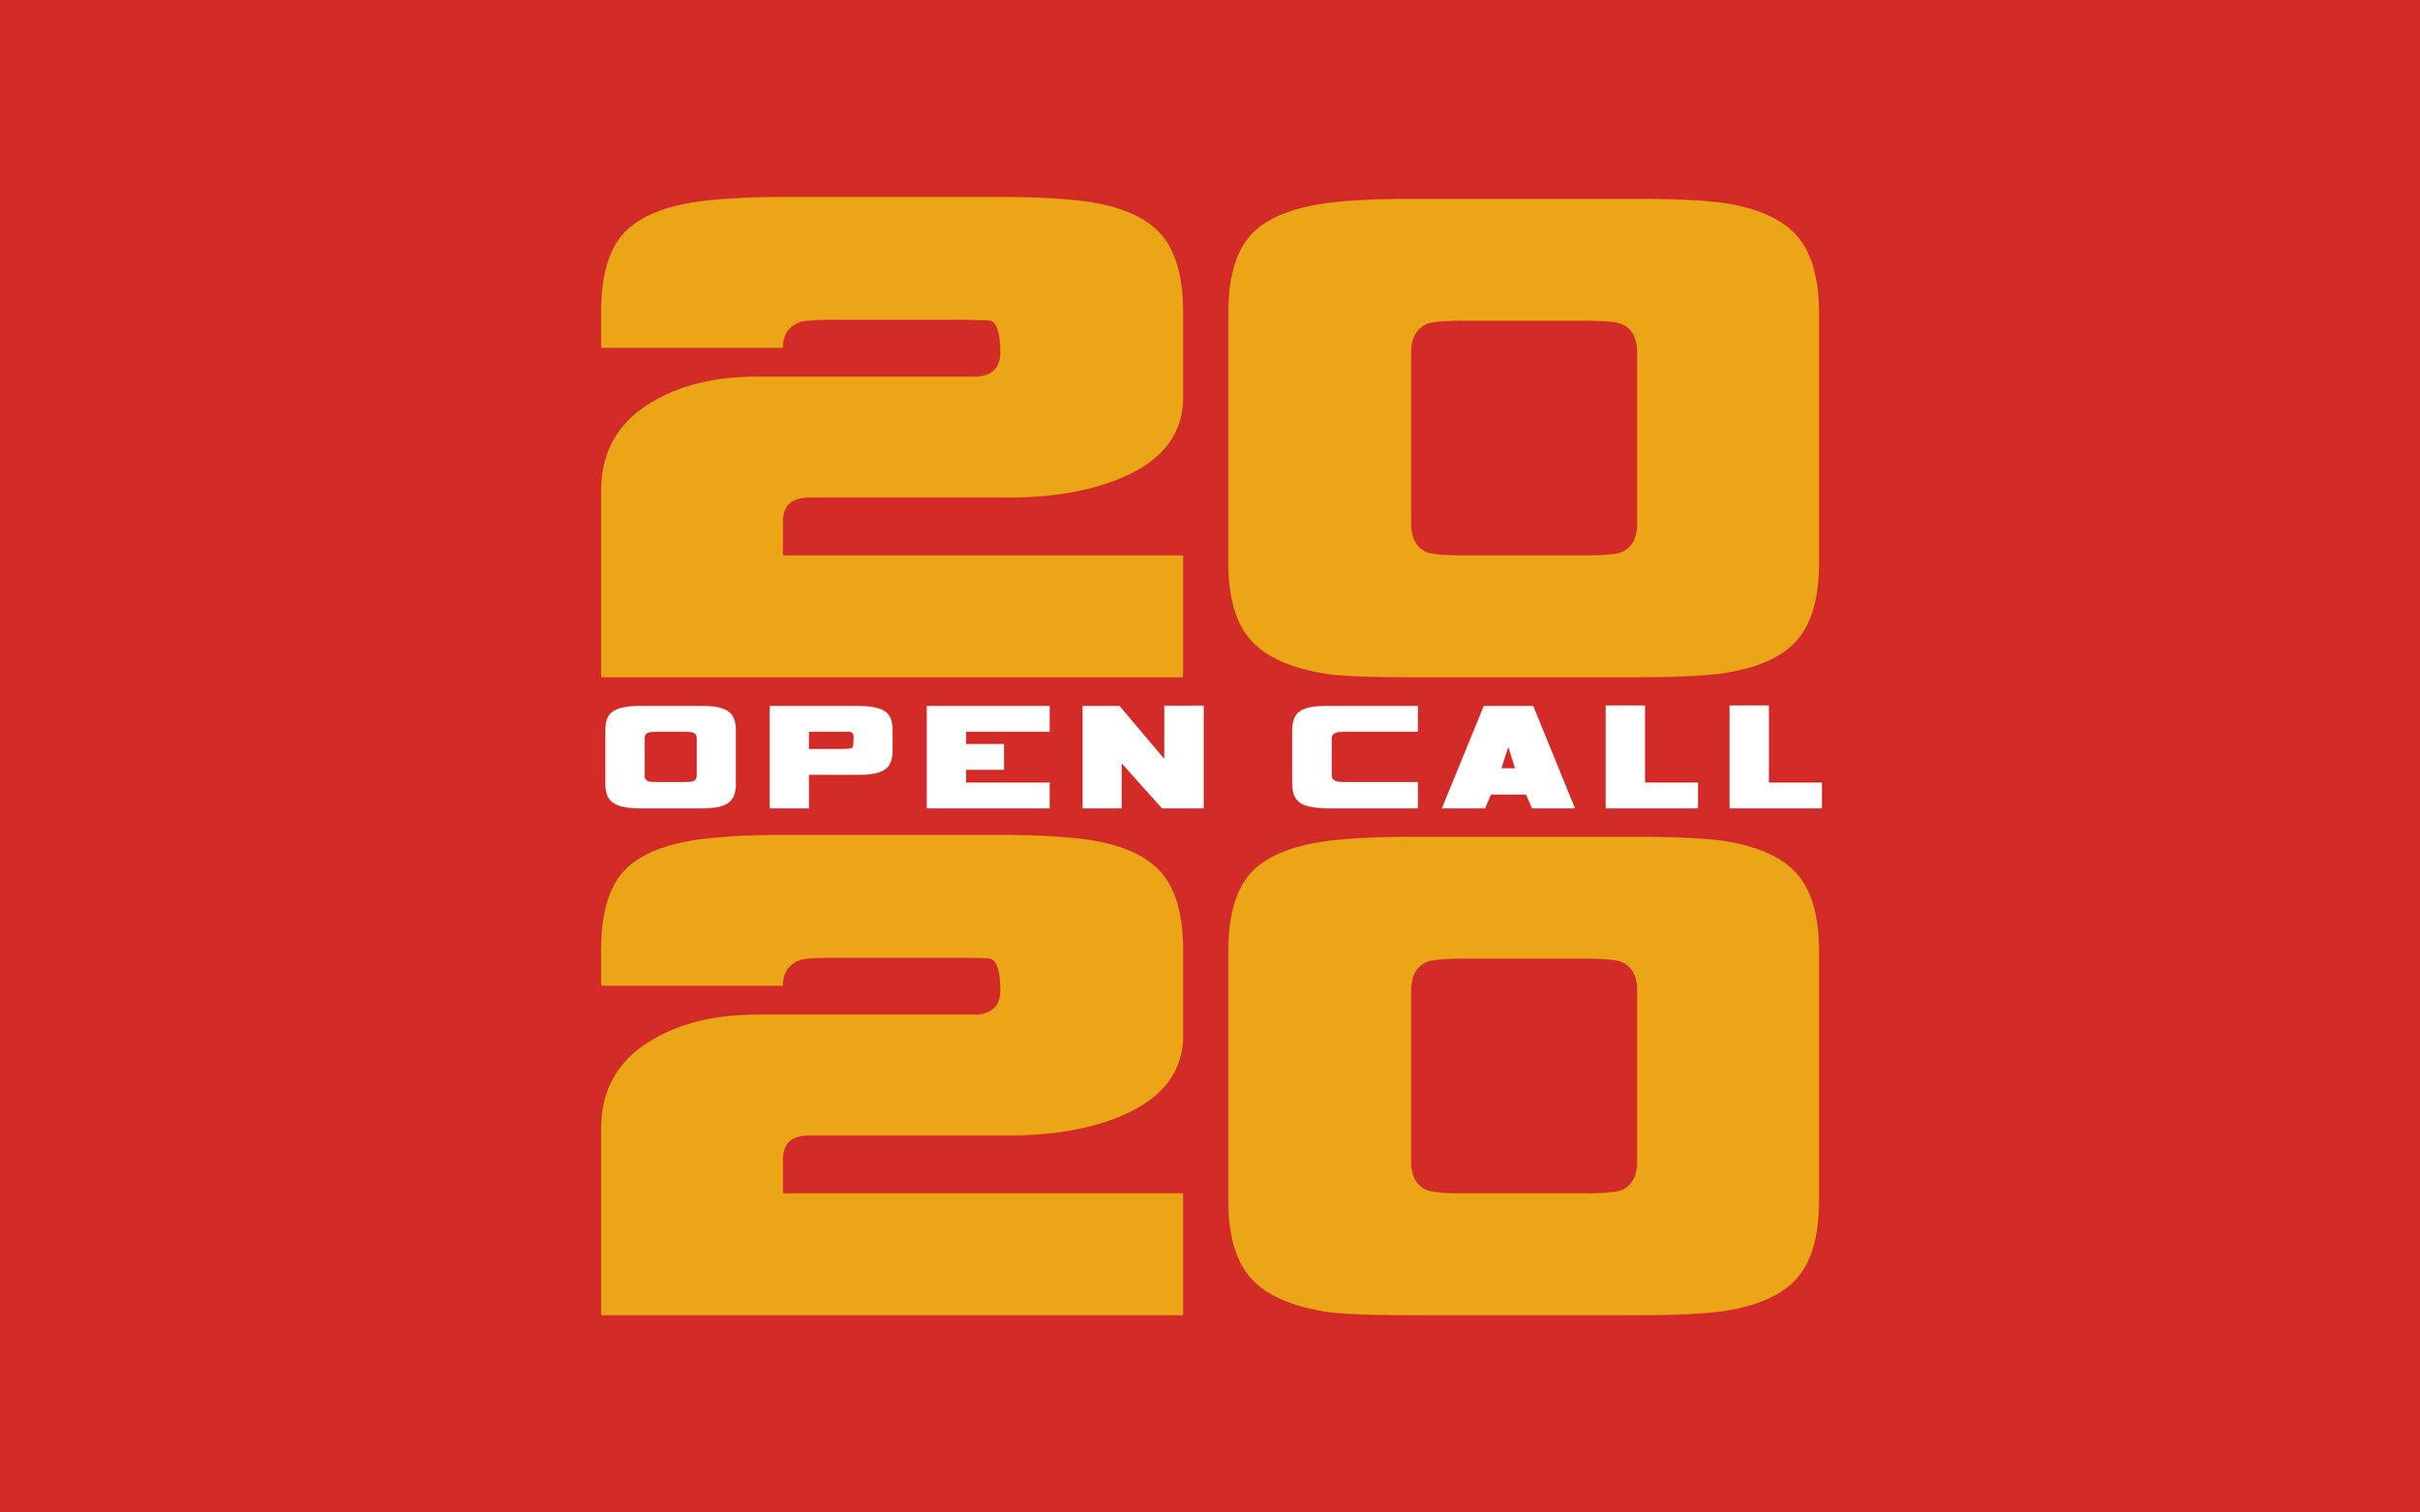 ecoca_opencall2020_webbanner3.jpg